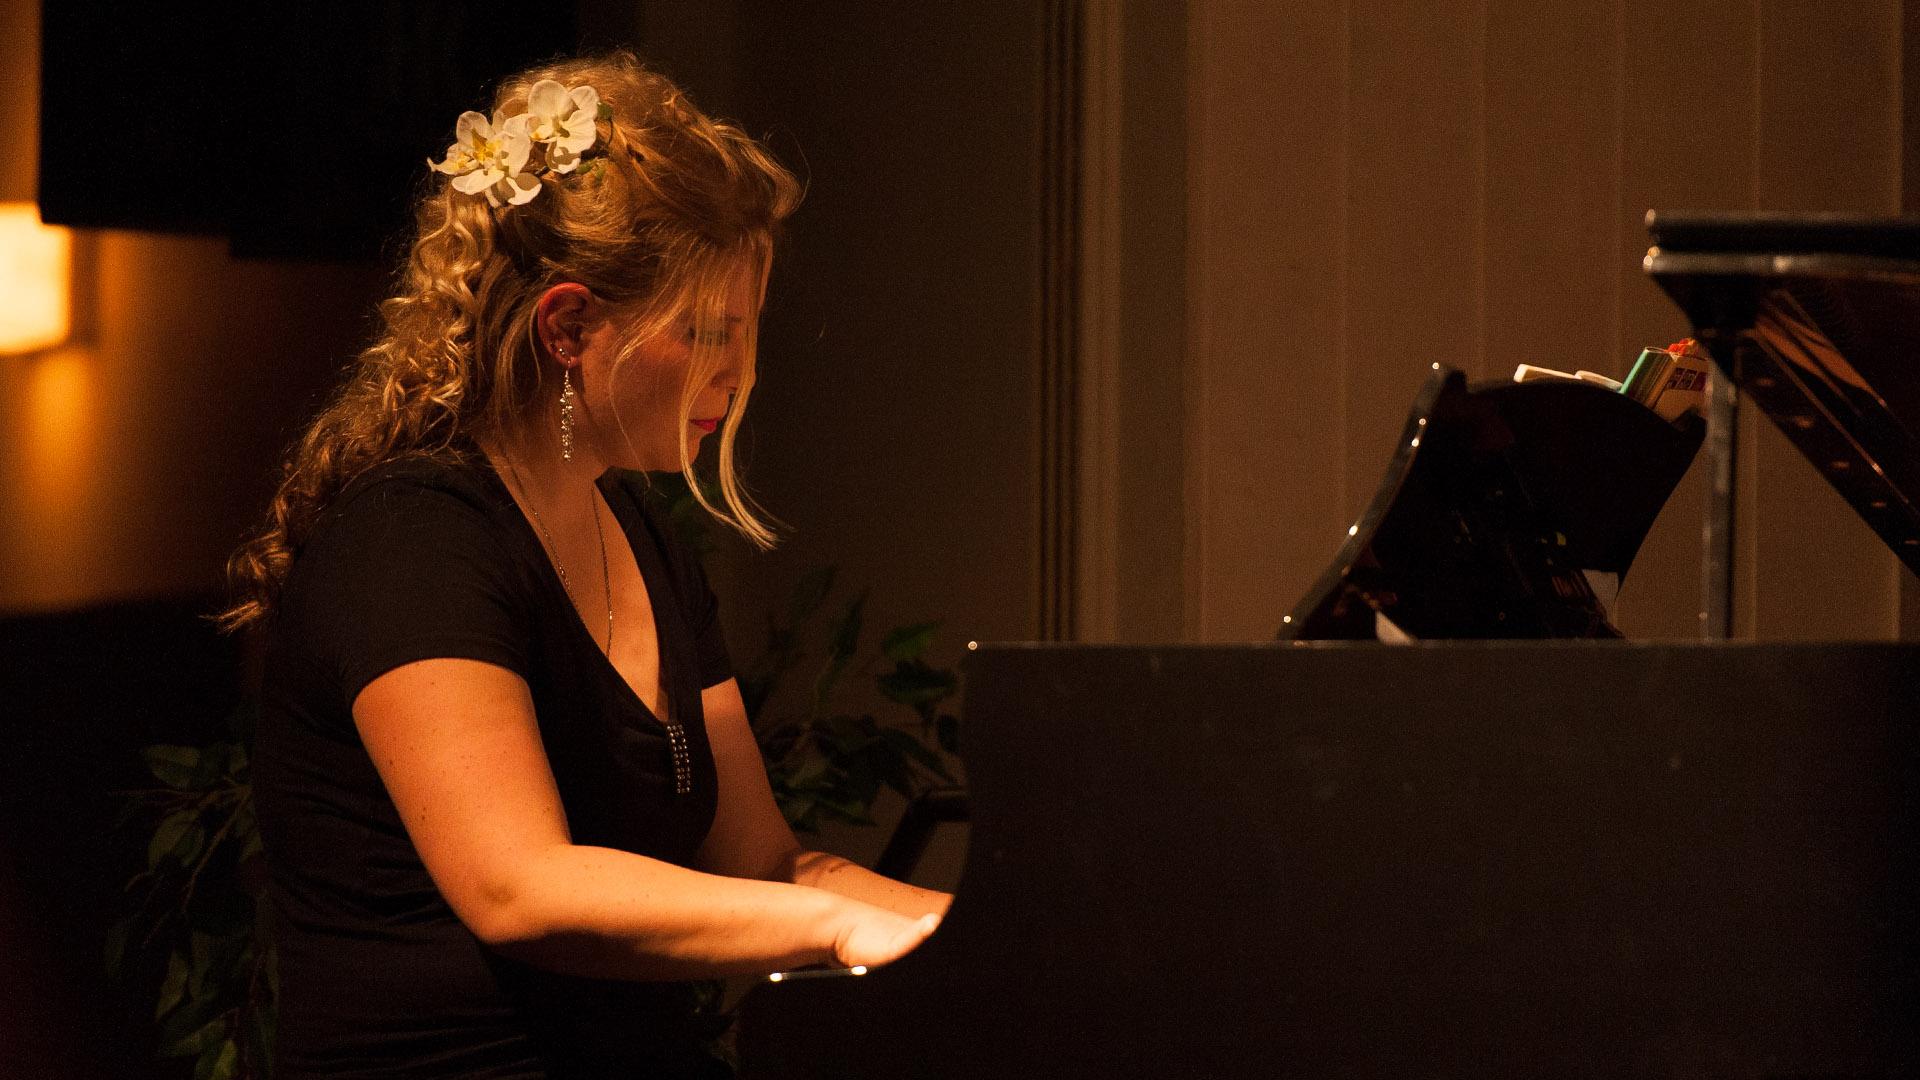 Konzertfotografie Konzert der Rimsingers Pianistin am Klavier im Schloss Amerang